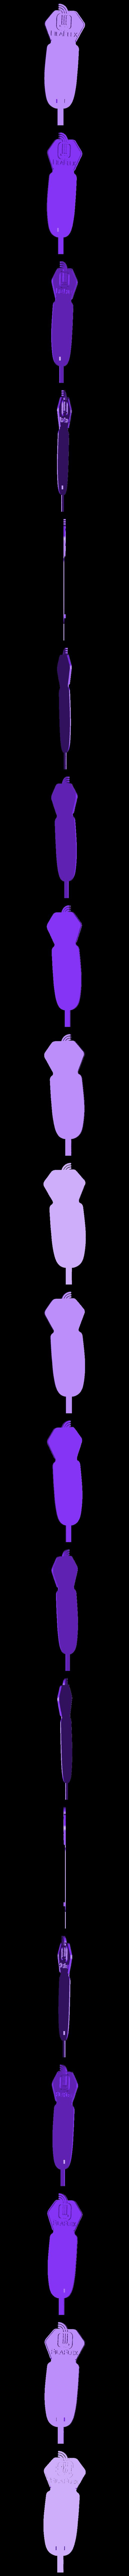 tongue_right.stl Download free STL file SNEAKERBOT in FILAFLEX by Recreus • 3D printable design, Ignacio